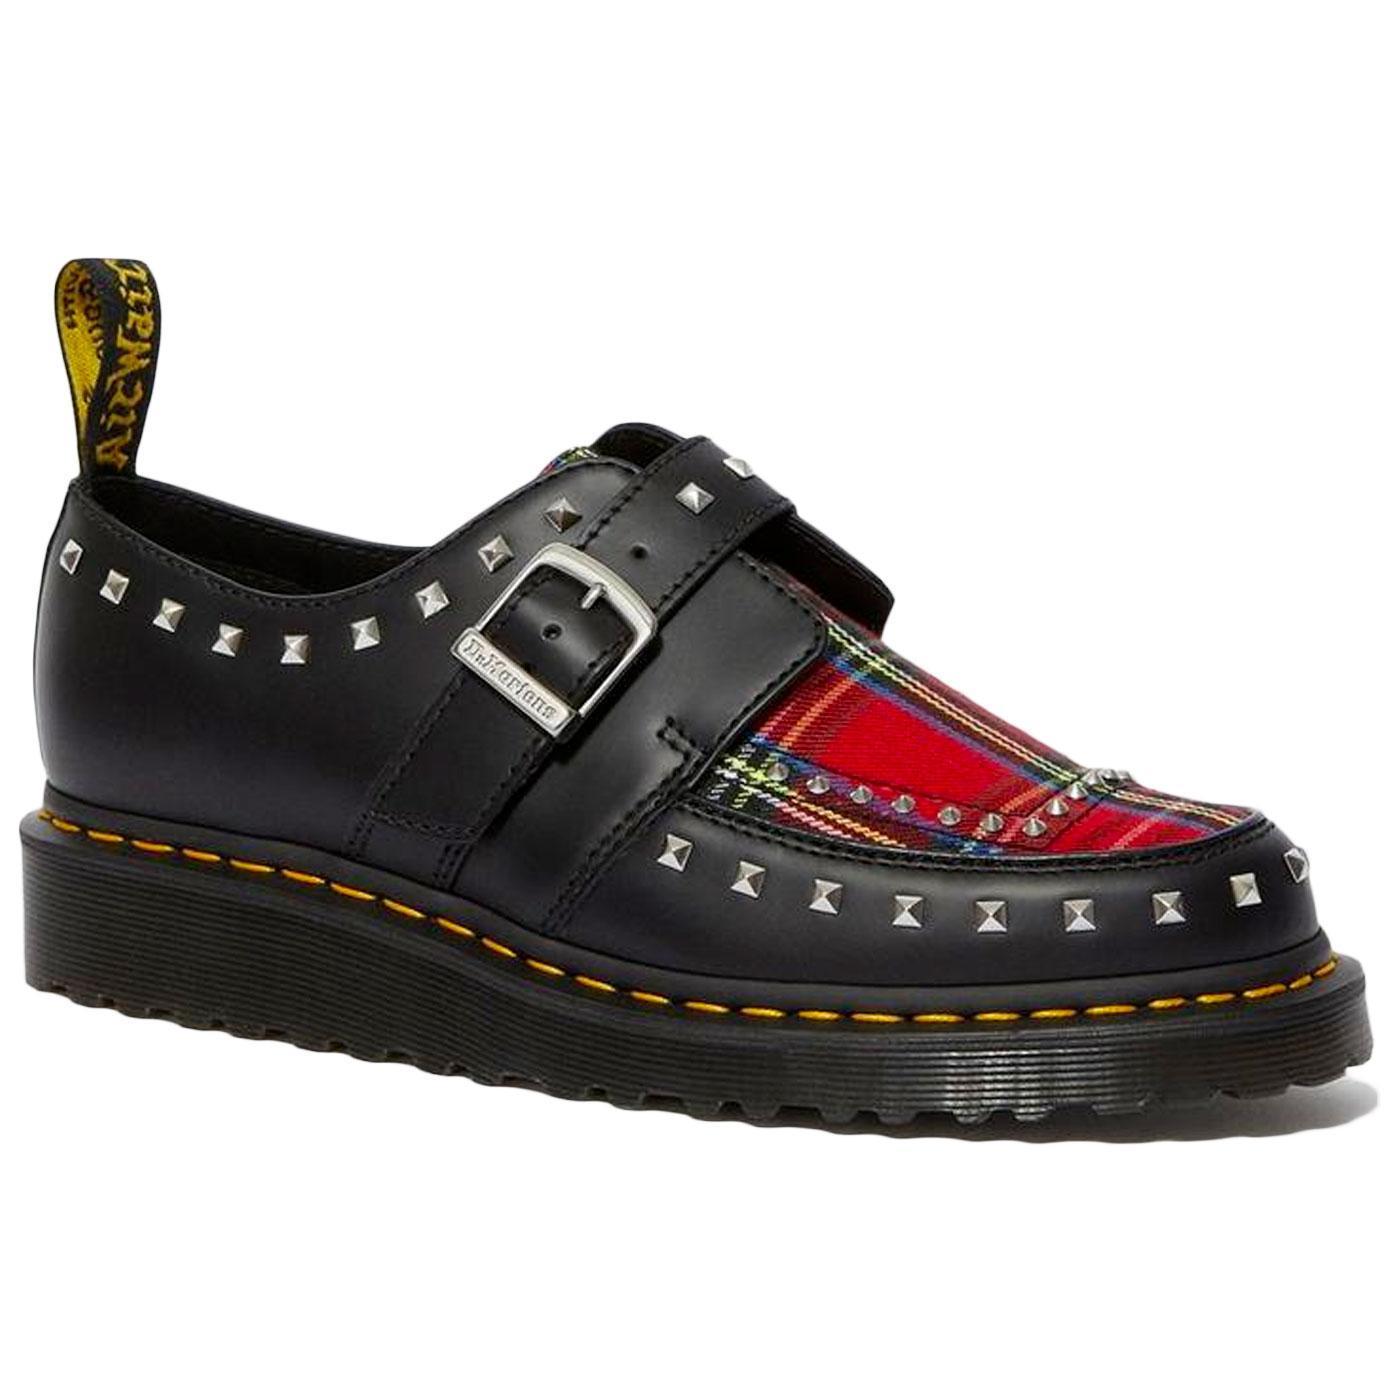 Ramsey DR MARTENS Punk Tartan Creeper Monk Shoes